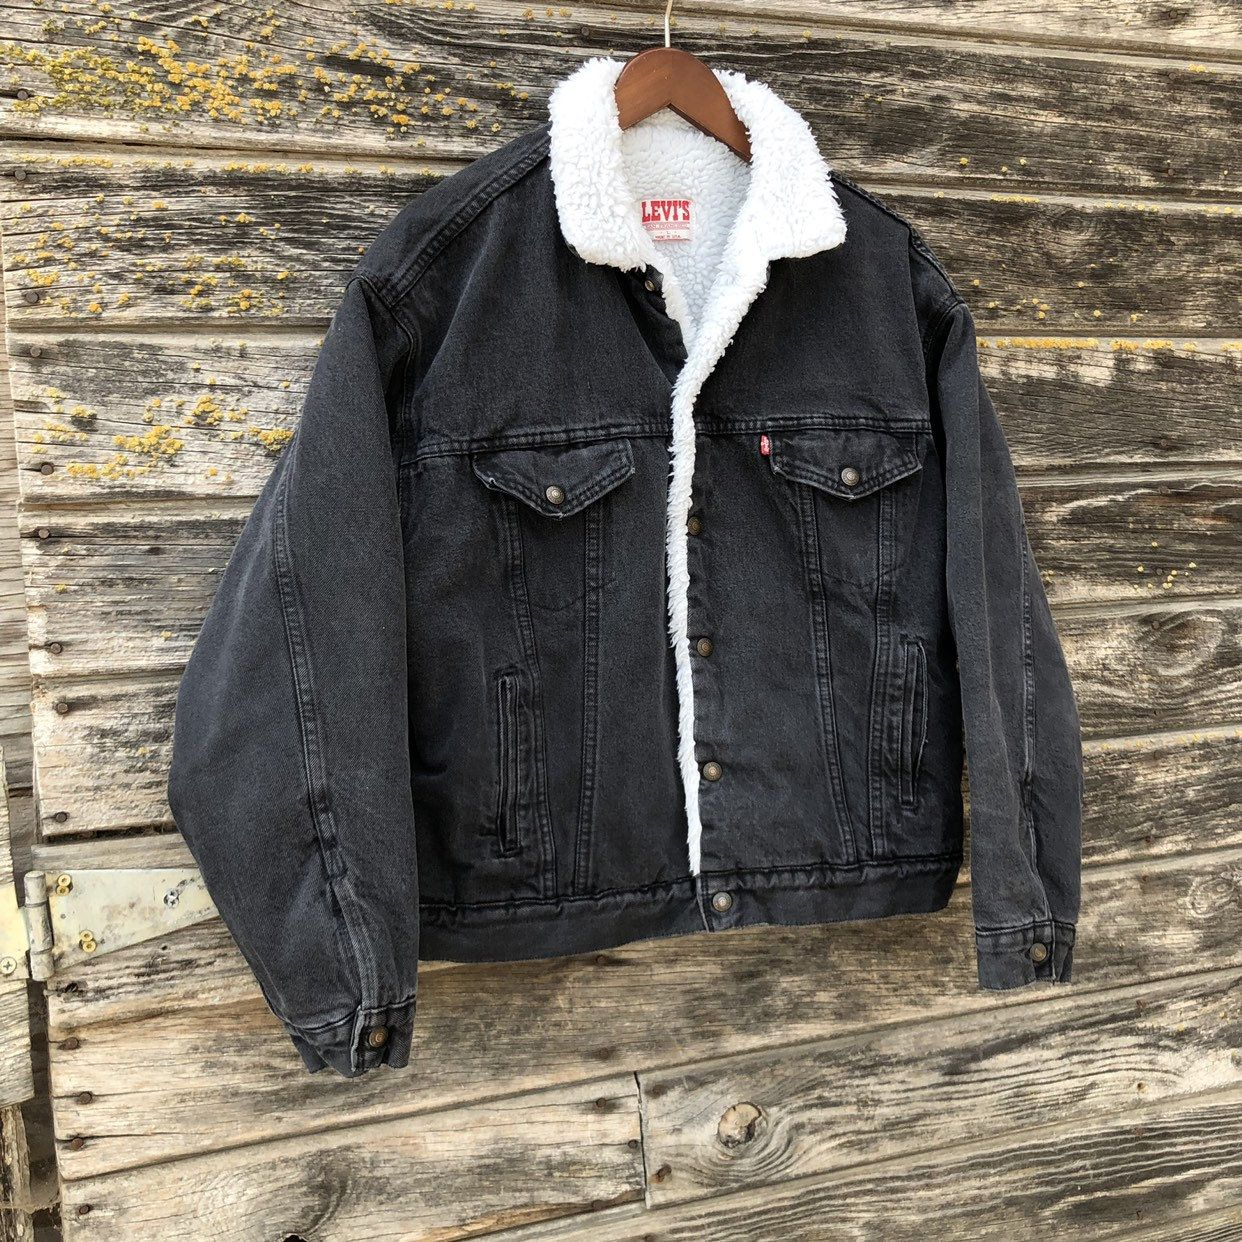 Vintage Levi S Sherpa Trucker Jacket Black Denim Grunge Coat Warm 90s Levis Faded Black Jean Jacket Bomber 80s Red Tab Levi Men L Large 48 Faded Black Jeans Black Jean Jacket